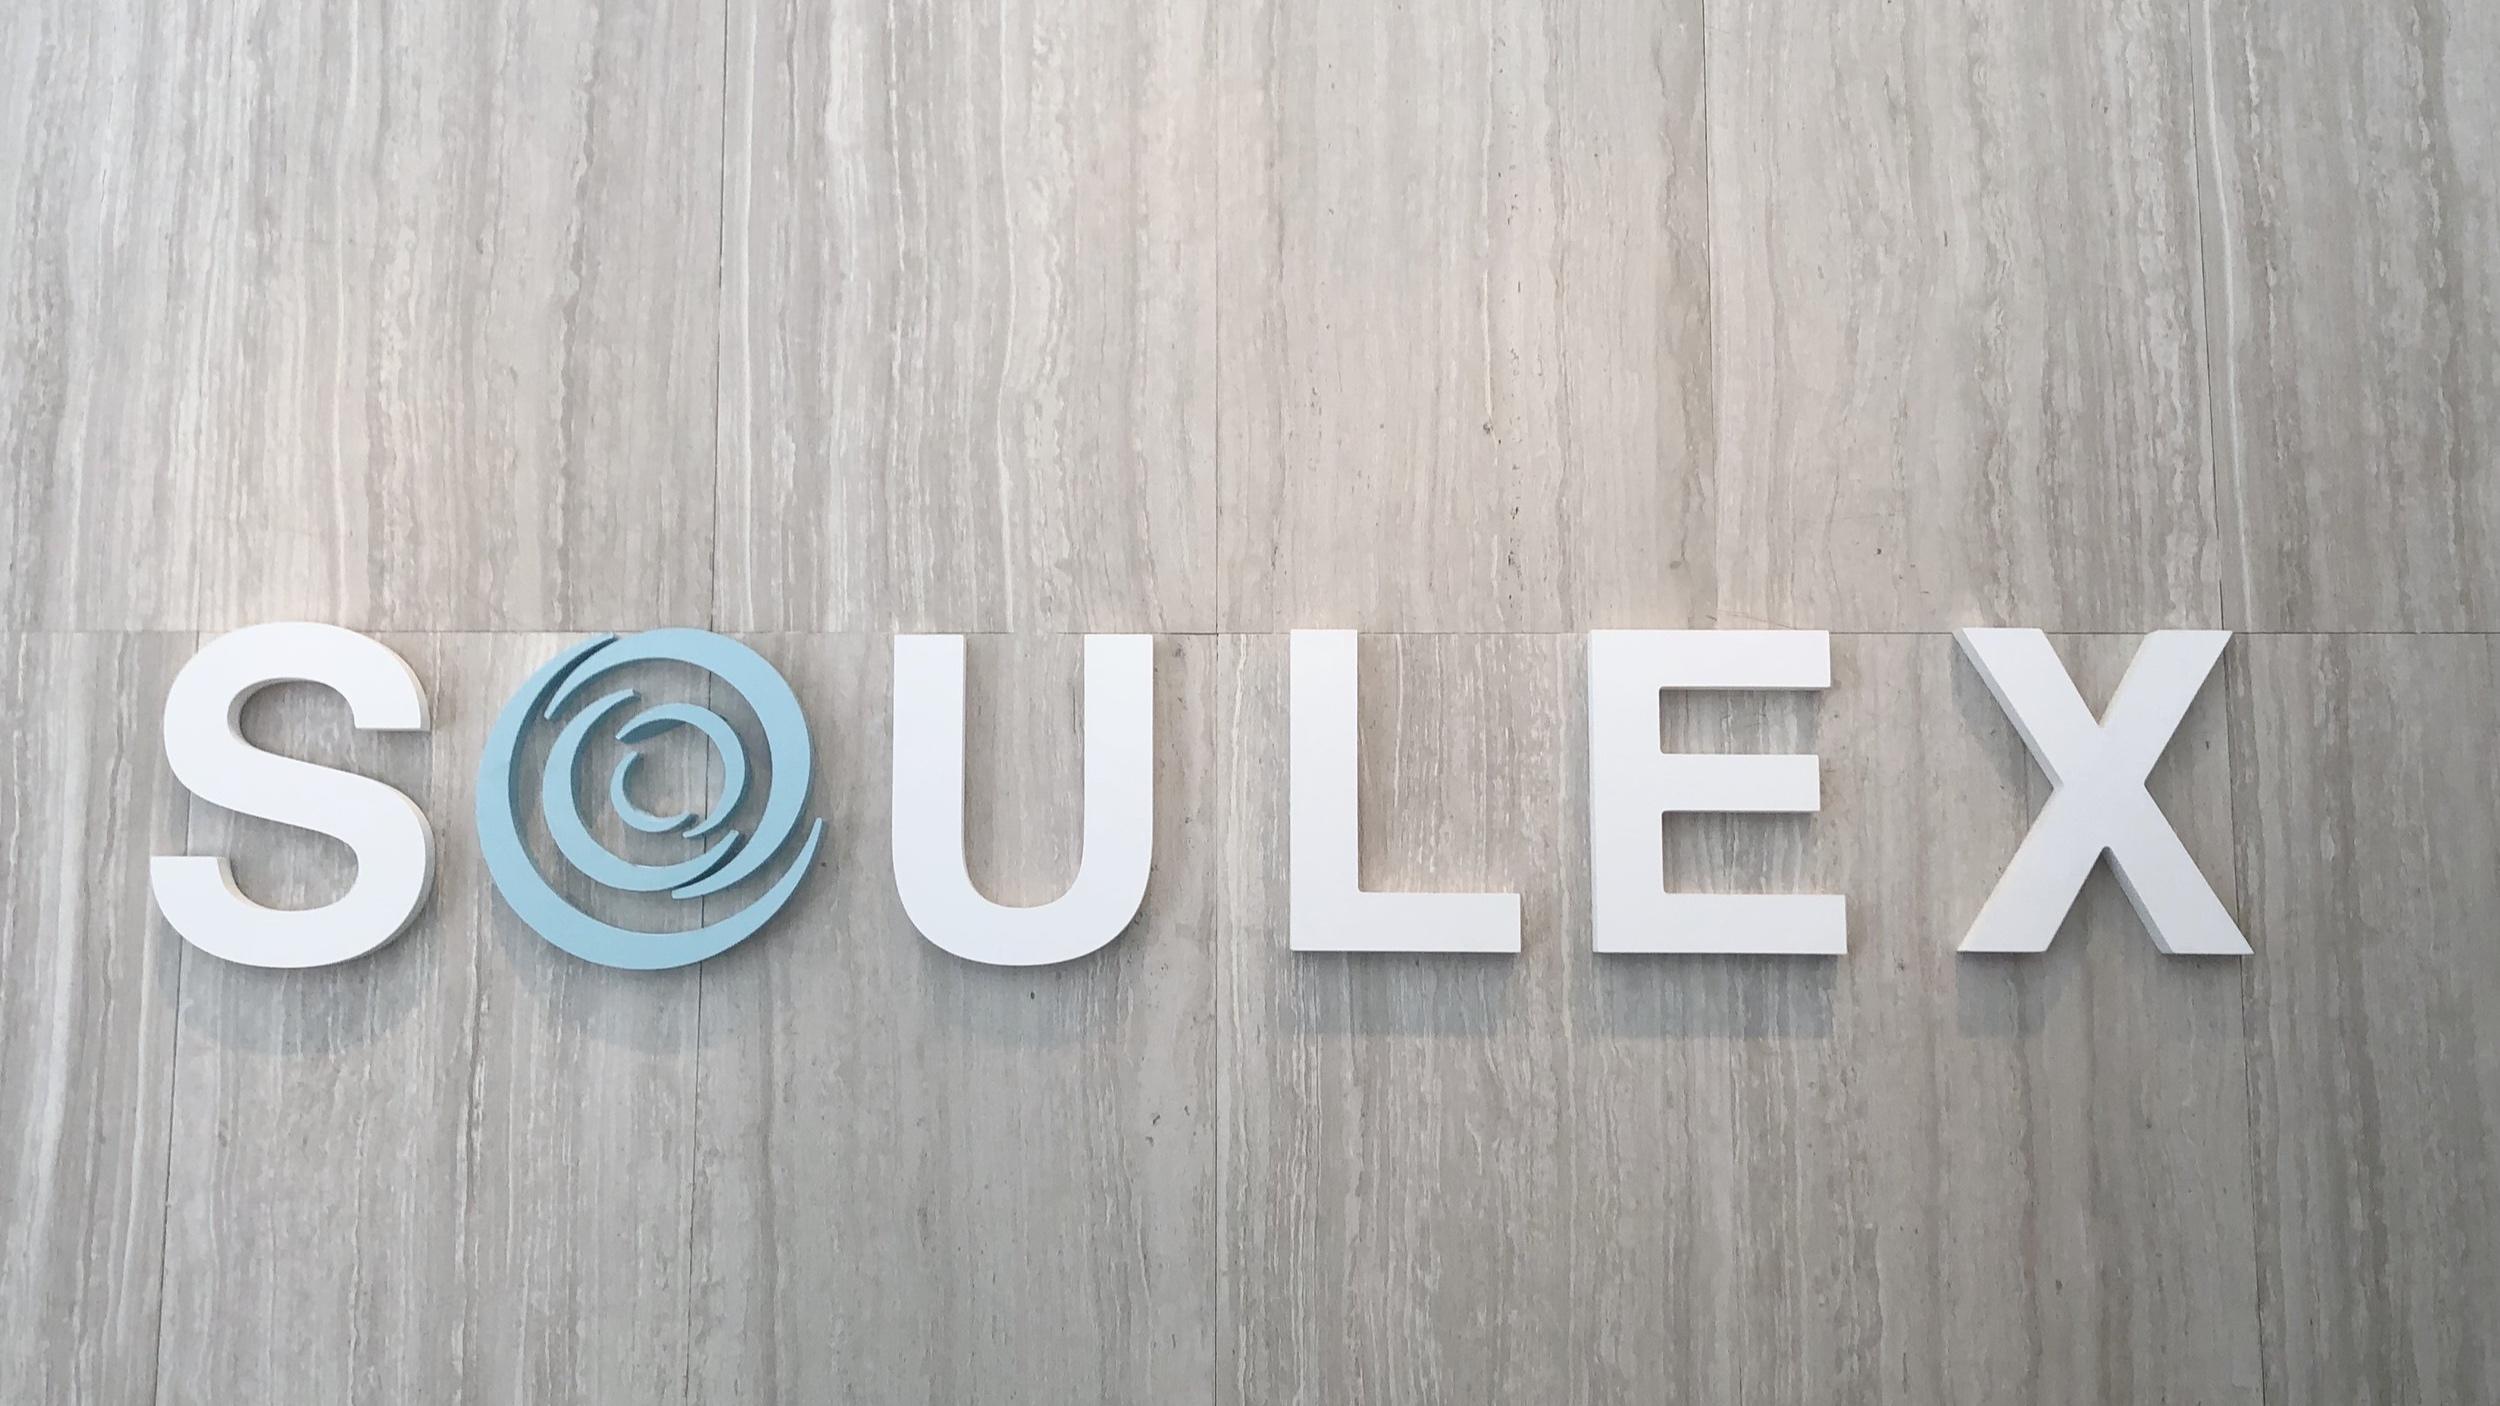 Soulex+Sign.jpg